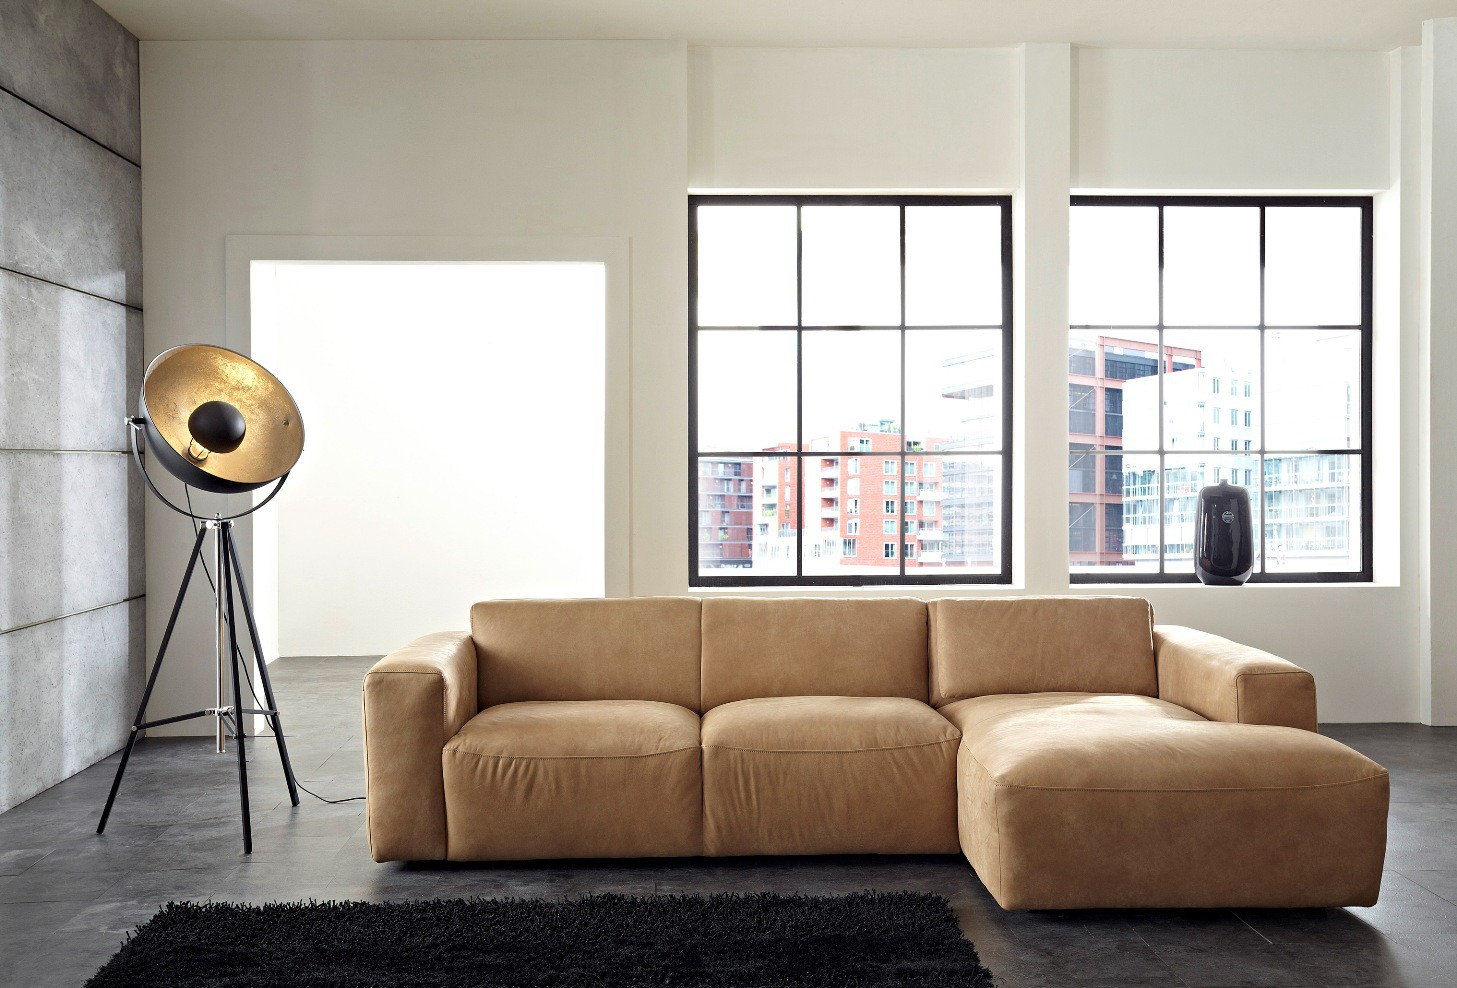 ledersofa pure lc. Black Bedroom Furniture Sets. Home Design Ideas